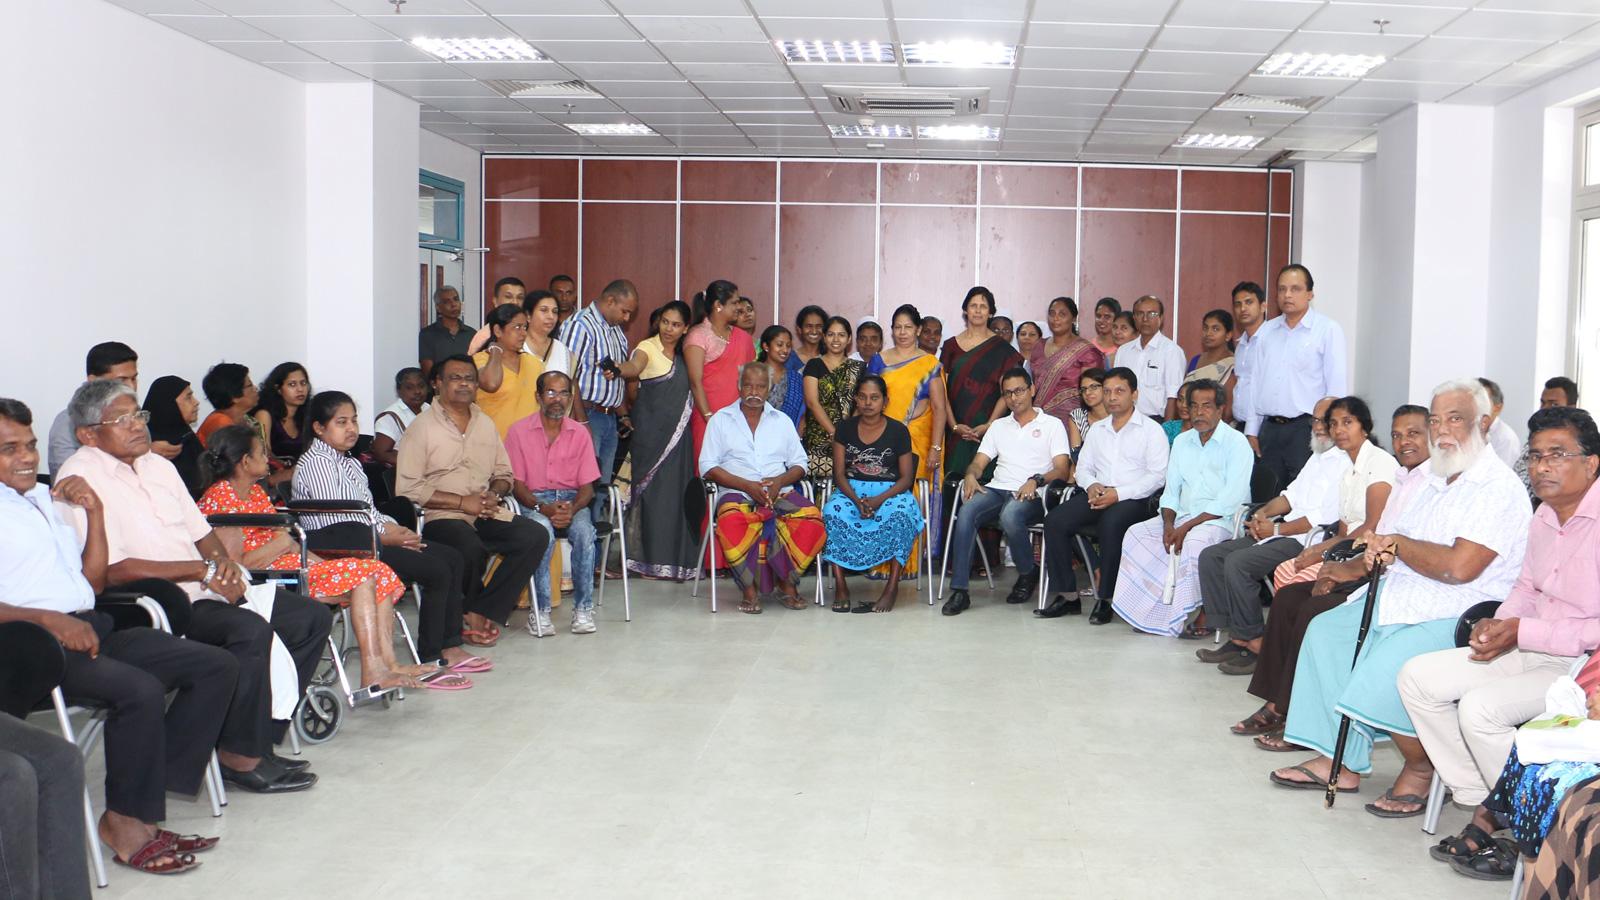 The SSO Sri Lanka group